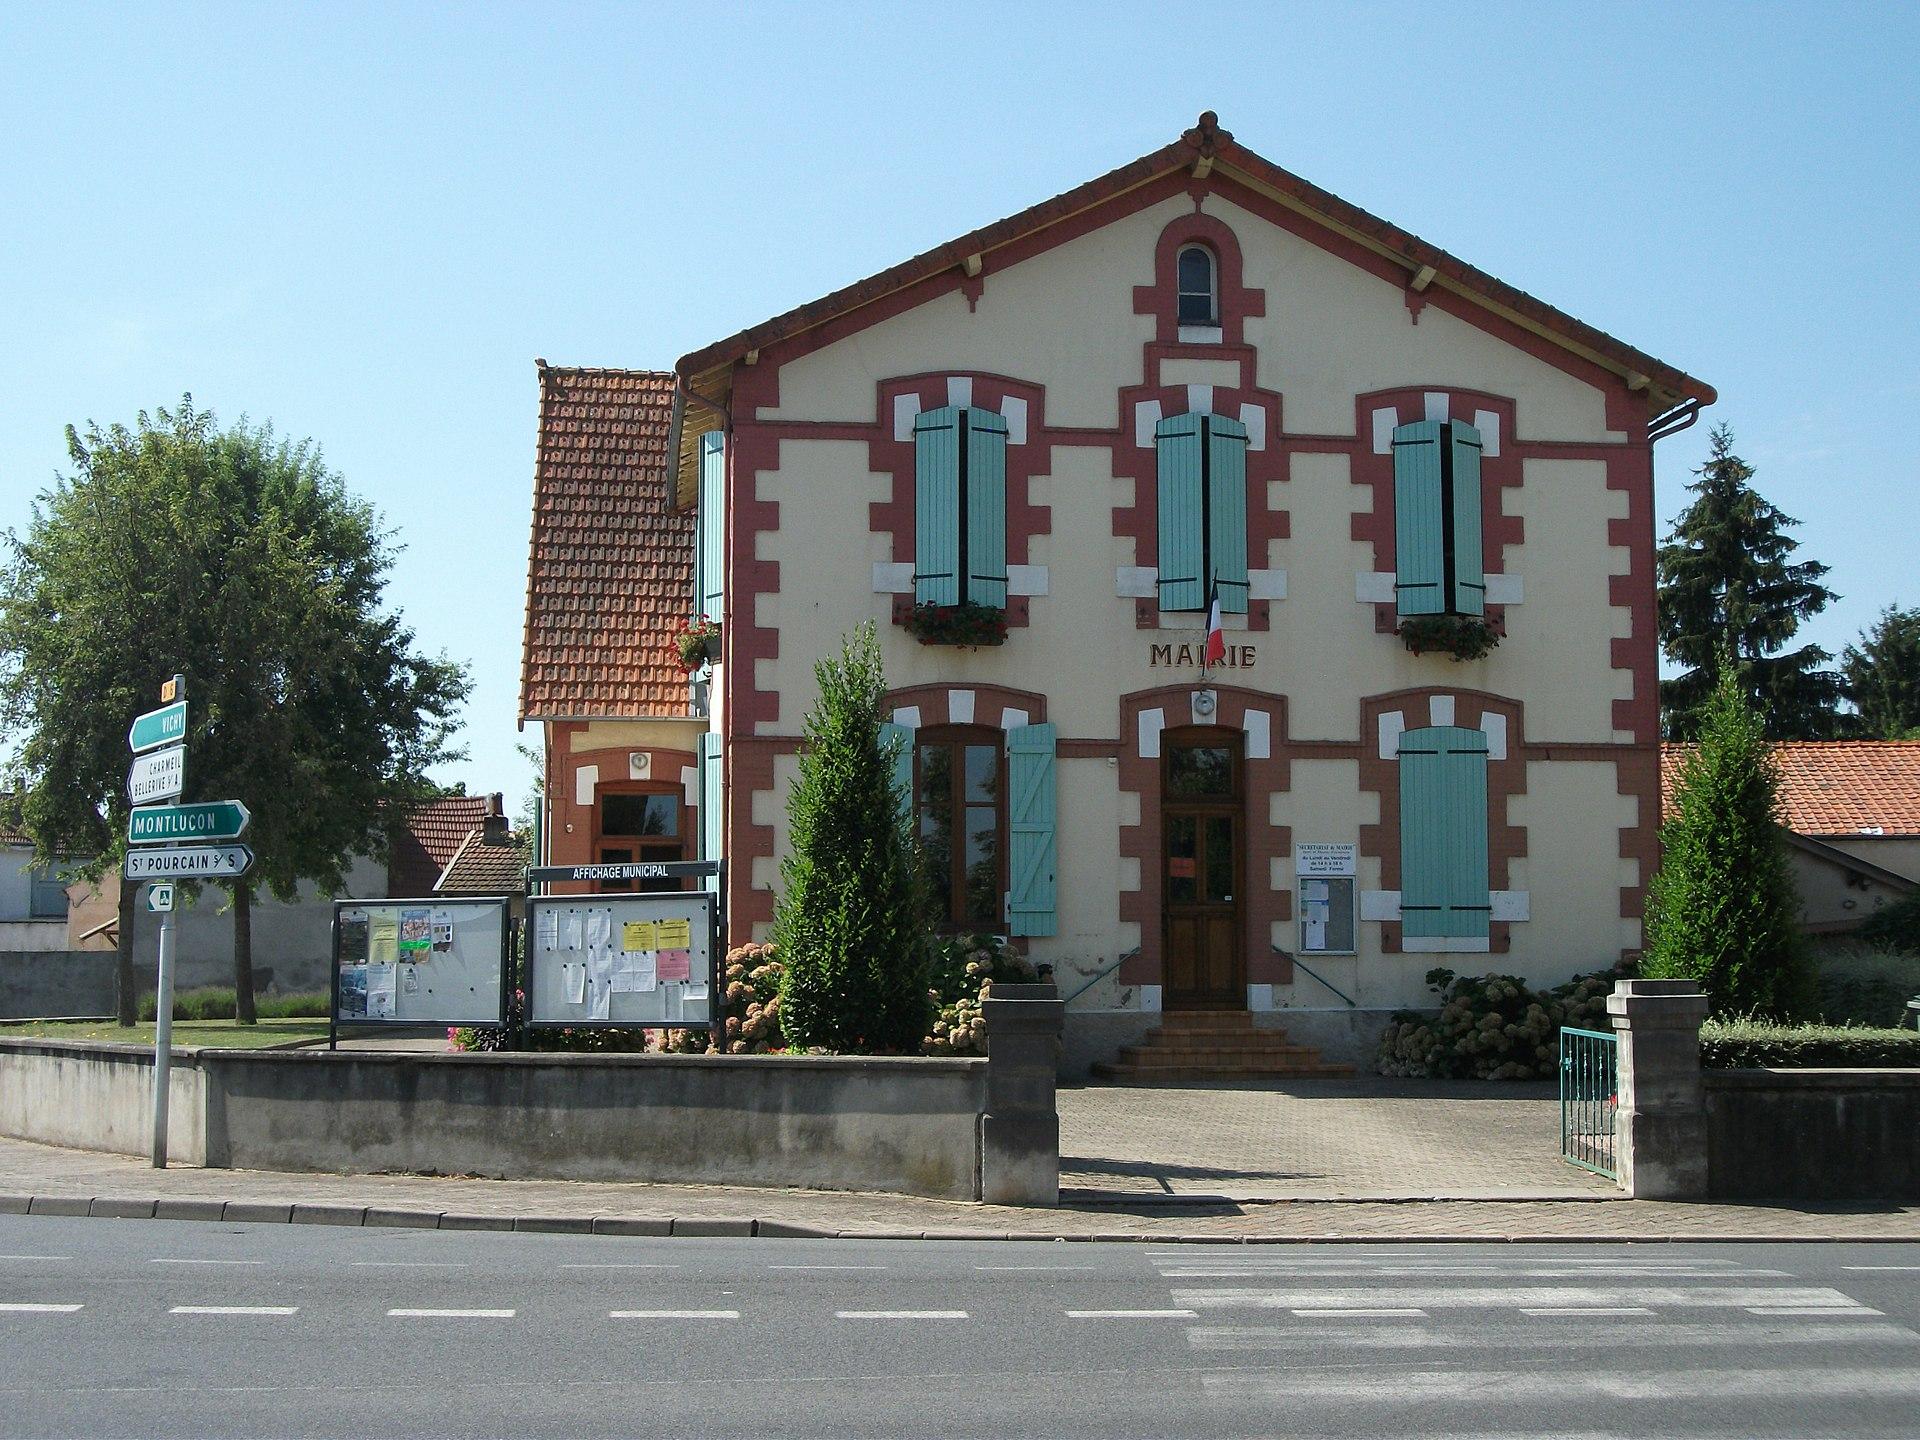 Restaurant Saint R Ef Bf Bdmy De Provencesite Webitin Ef Bf Bdraire